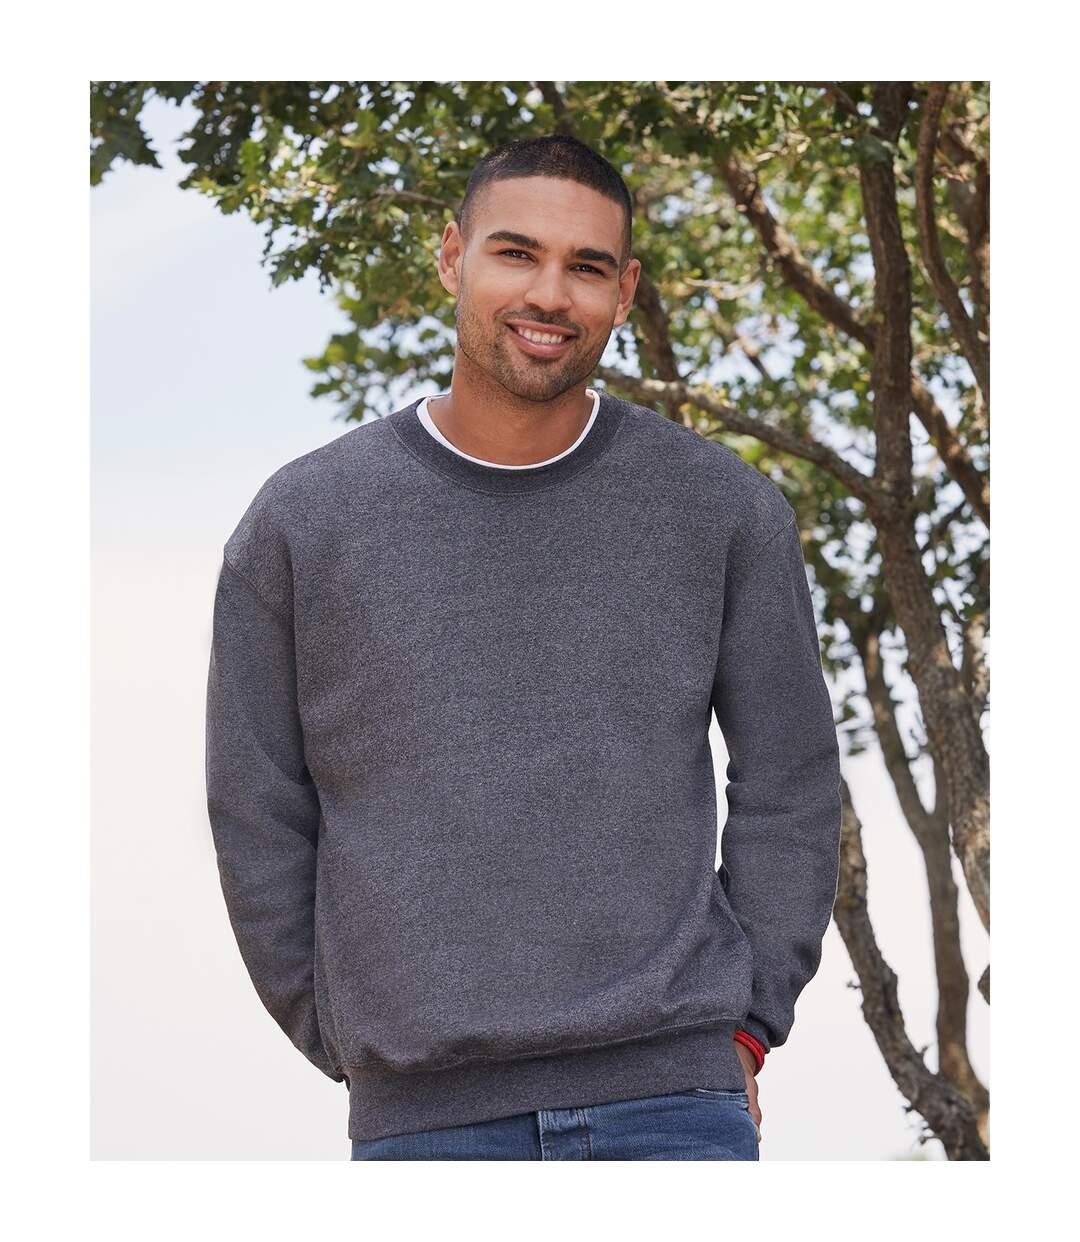 Fruit Of The Loom Mens Set-In Belcoro® Yarn Sweatshirt (Heather Navy) - UTBC365